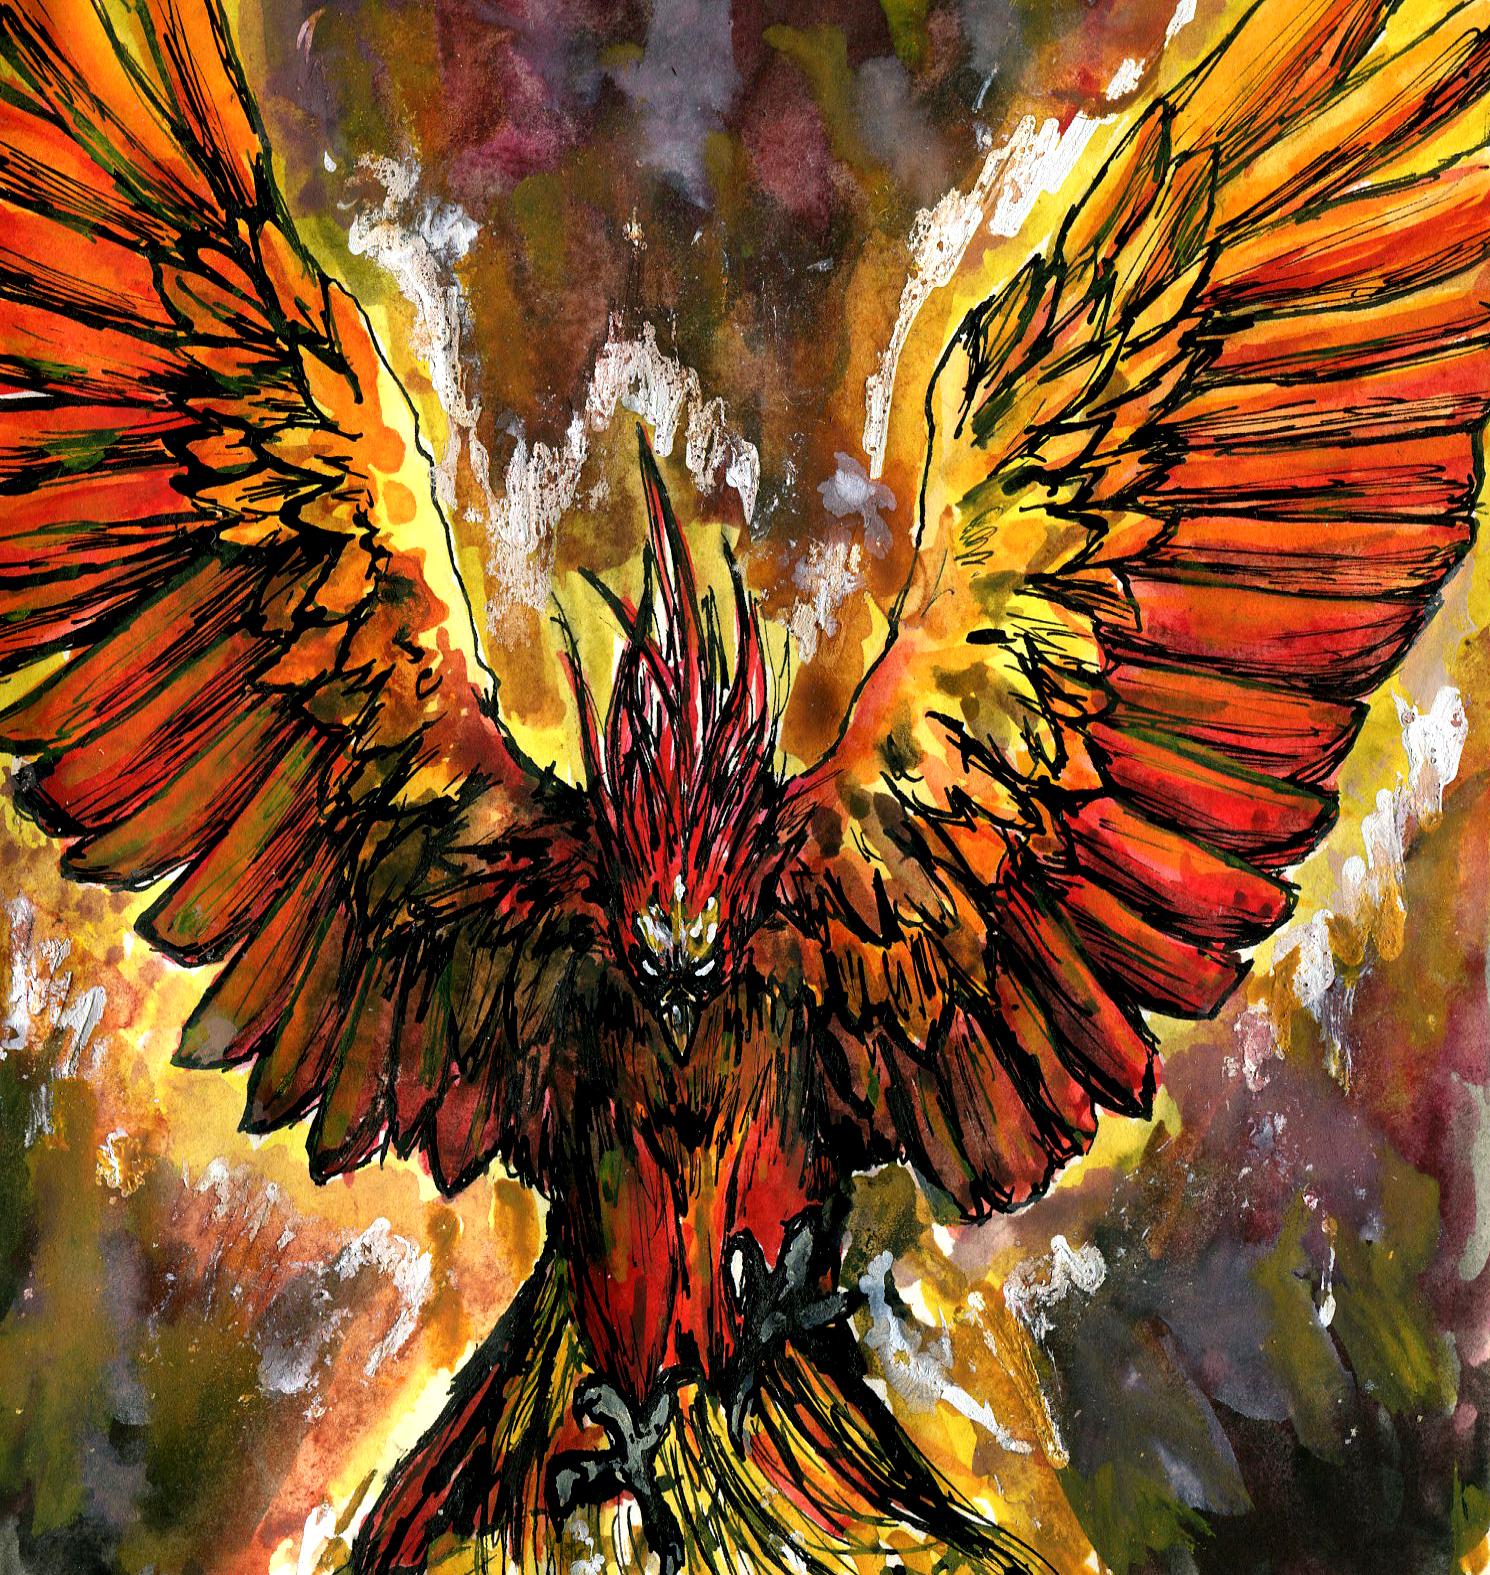 1M. Arabian Phoenix